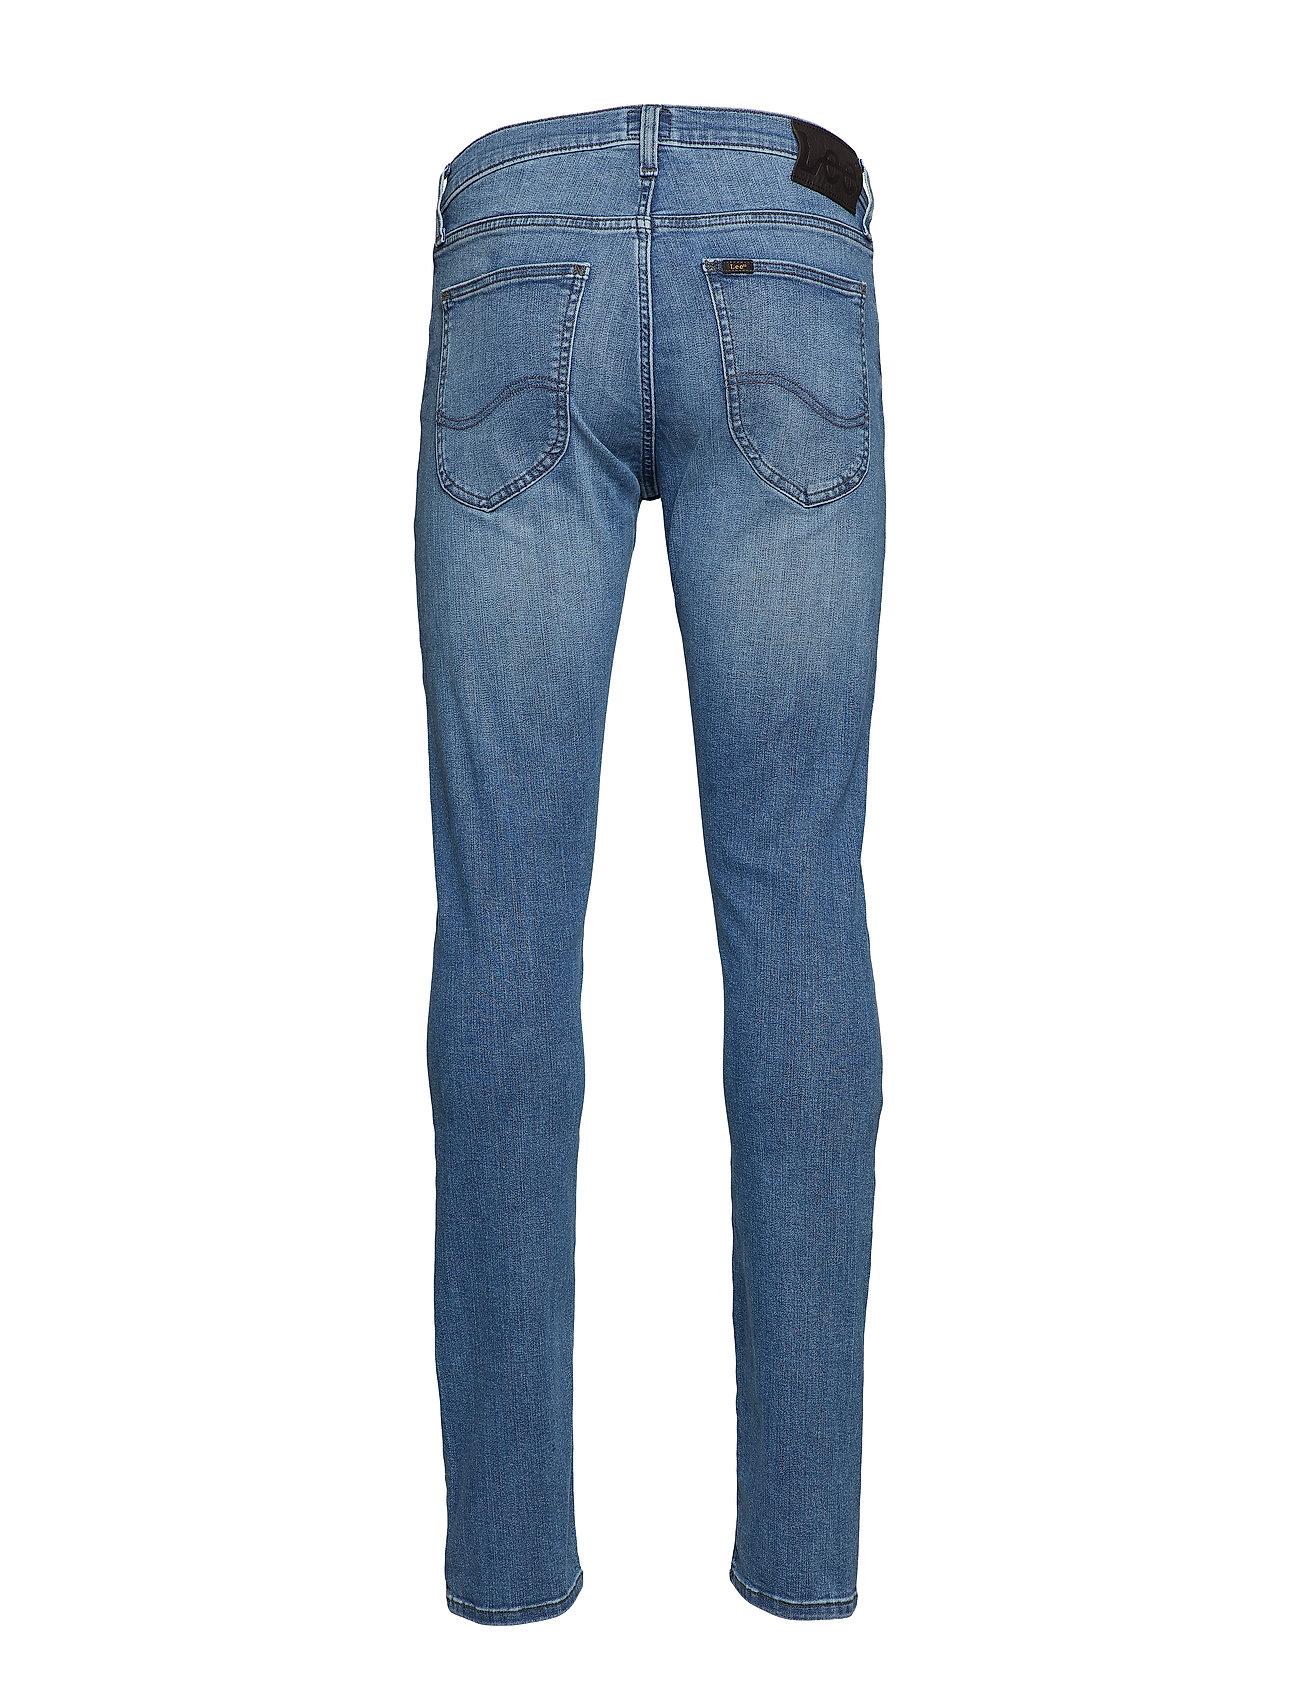 LukeminimaleeLee Jeans Jeans Jeans LukeminimaleeLee Jeans LukeminimaleeLee LukeminimaleeLee j3Lq54AR